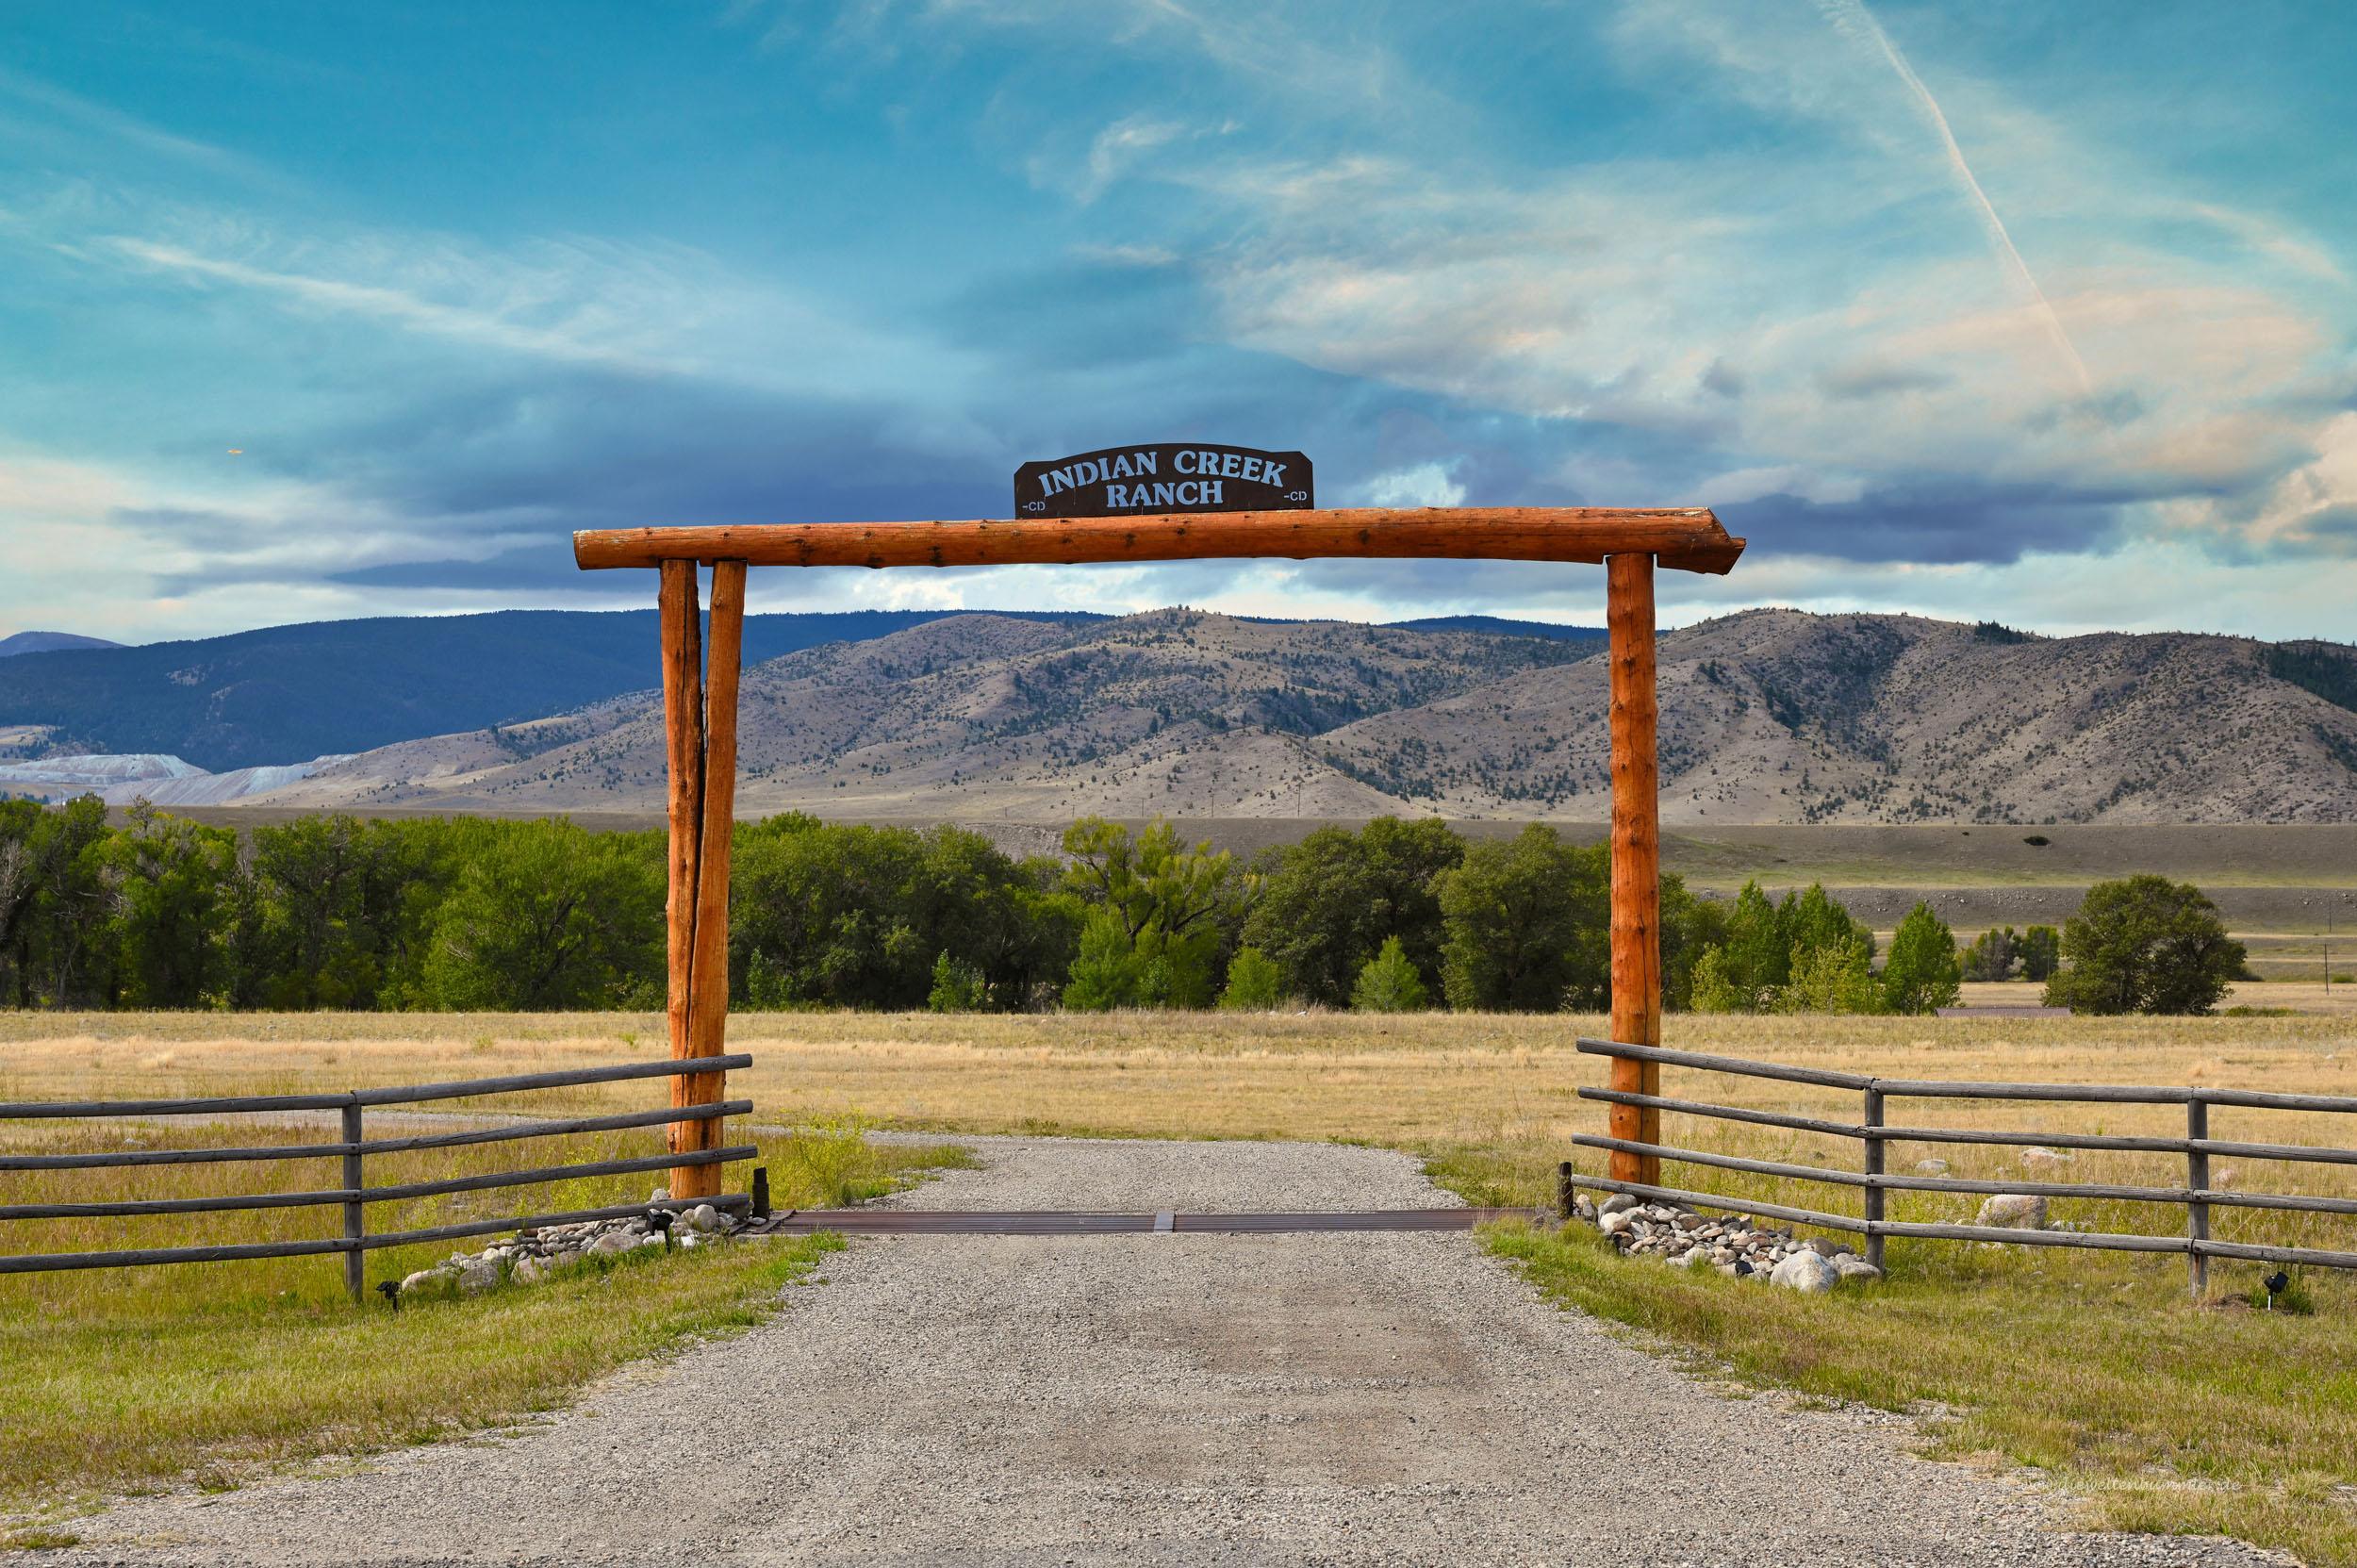 Indian Creek Ranch in Montana